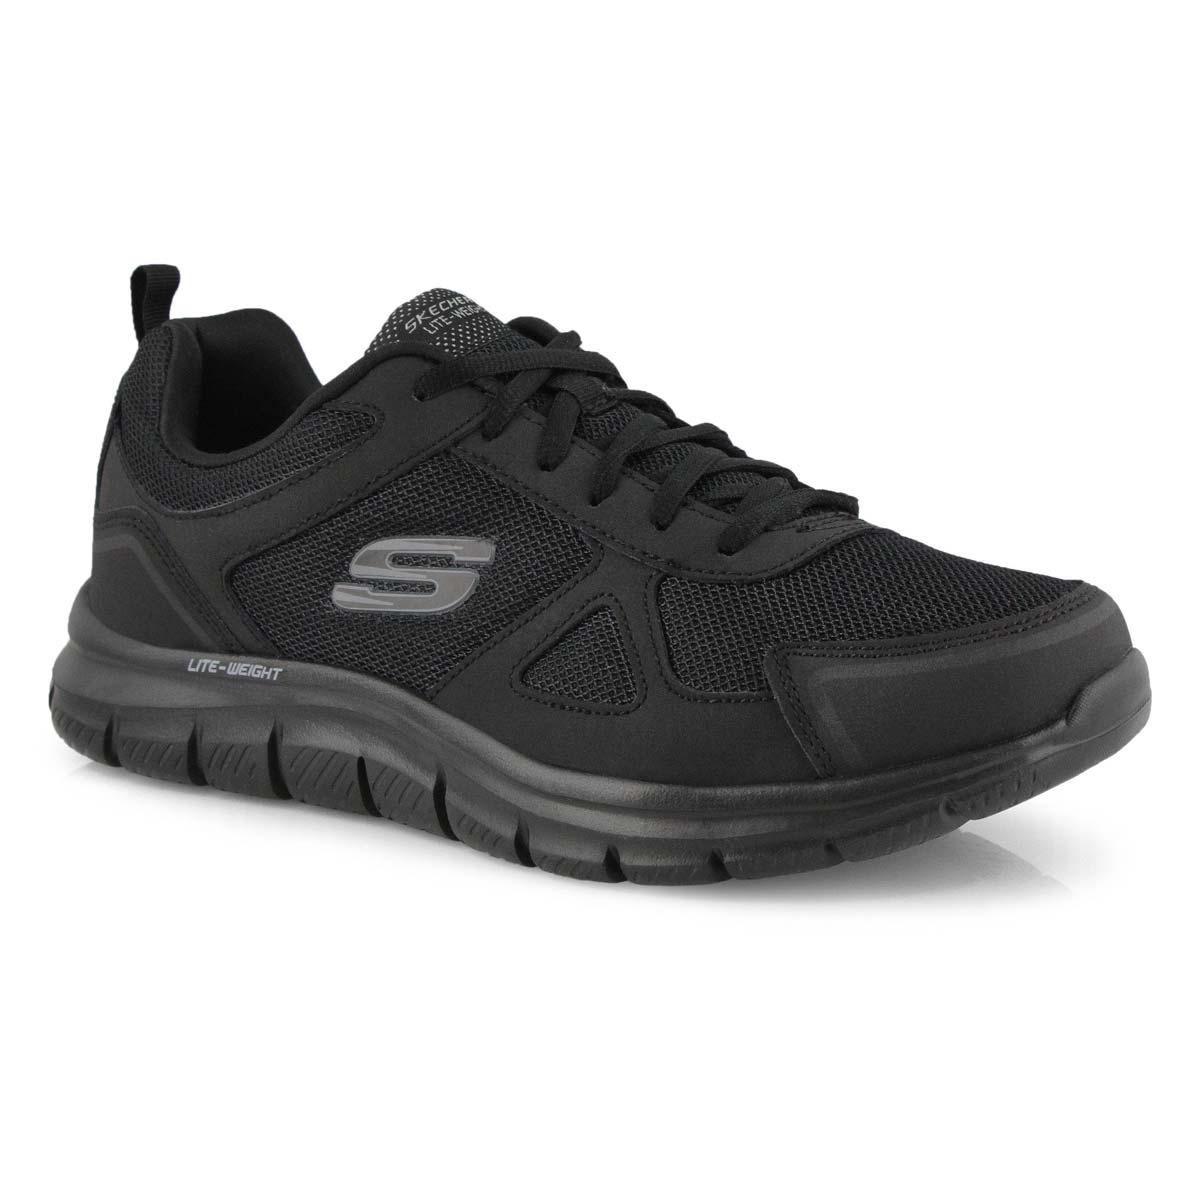 Men's Track Scloric Sneakers Wide - Black